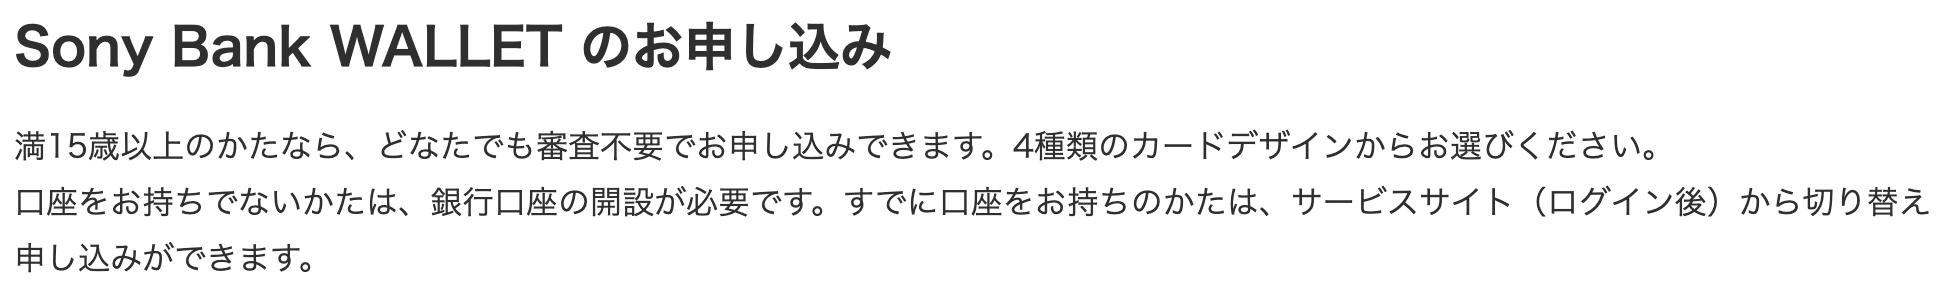 Sony bank WALLET のお申し込み デビットカード 審査